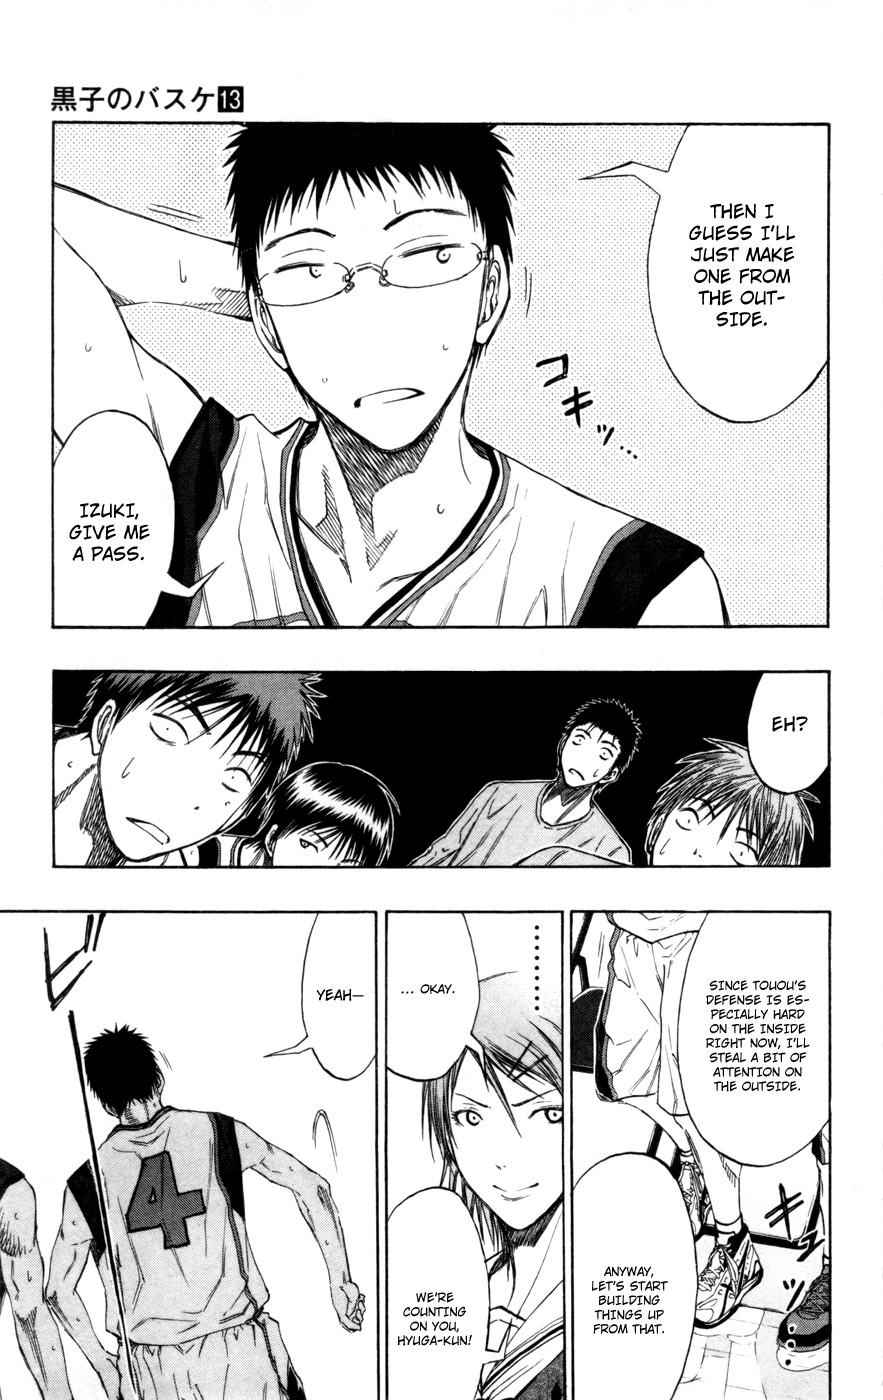 Kuroko no Basket Manga Chapter 117 - Image 3_181